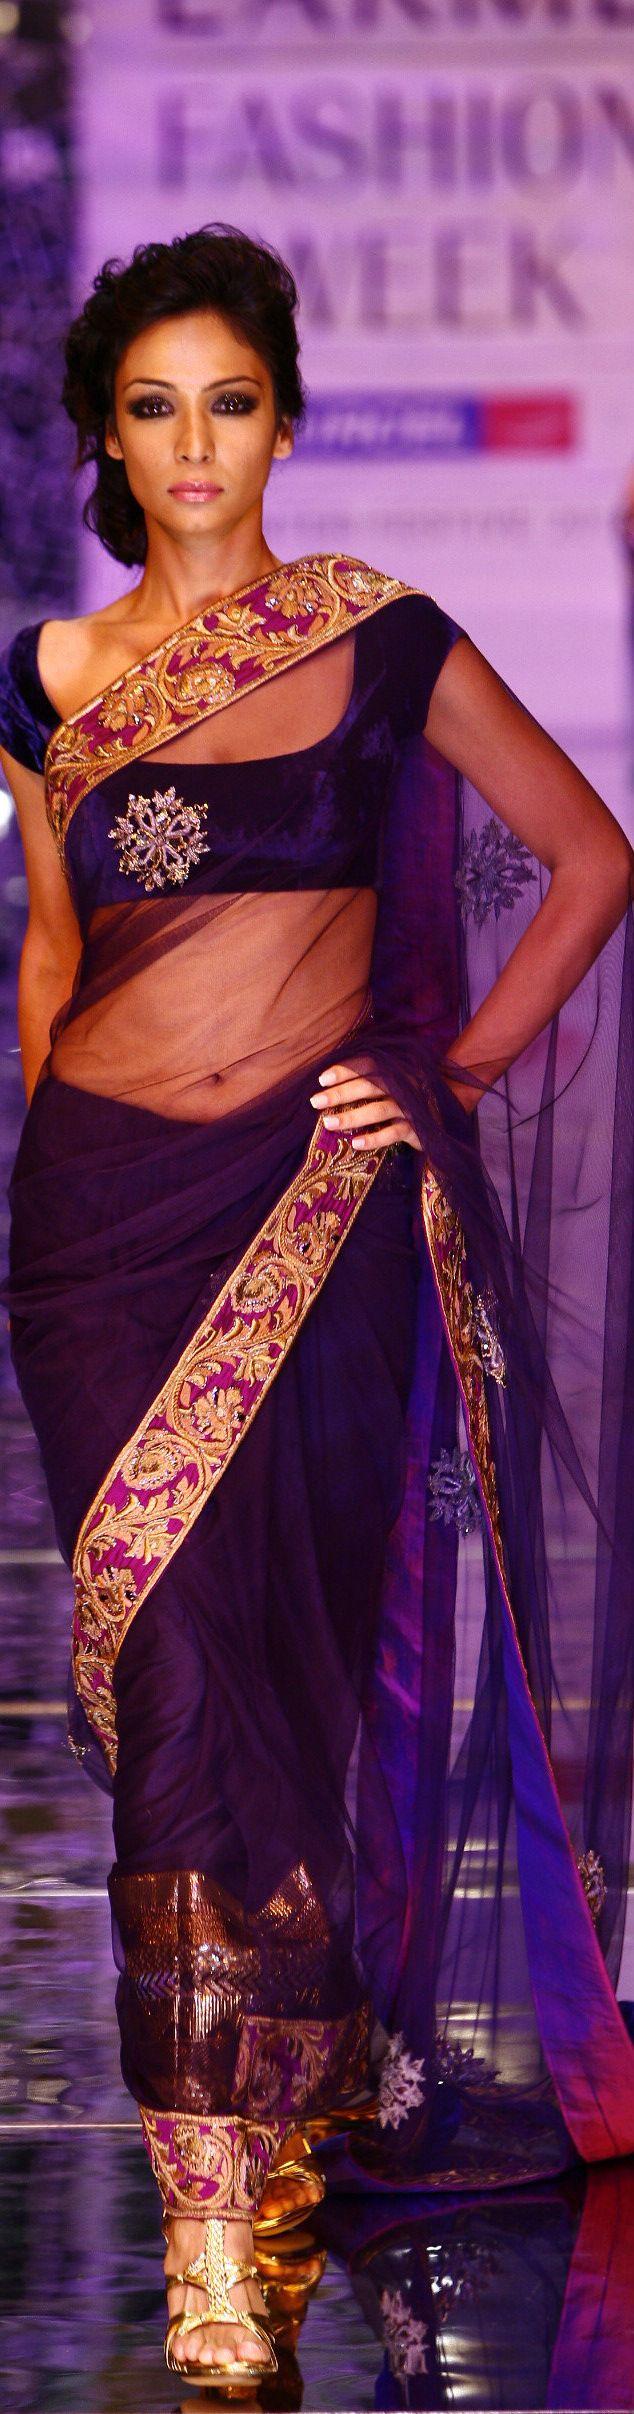 Manish Malhotra Collection at Lakme Fashion Week 2010. original pin by @webjournal